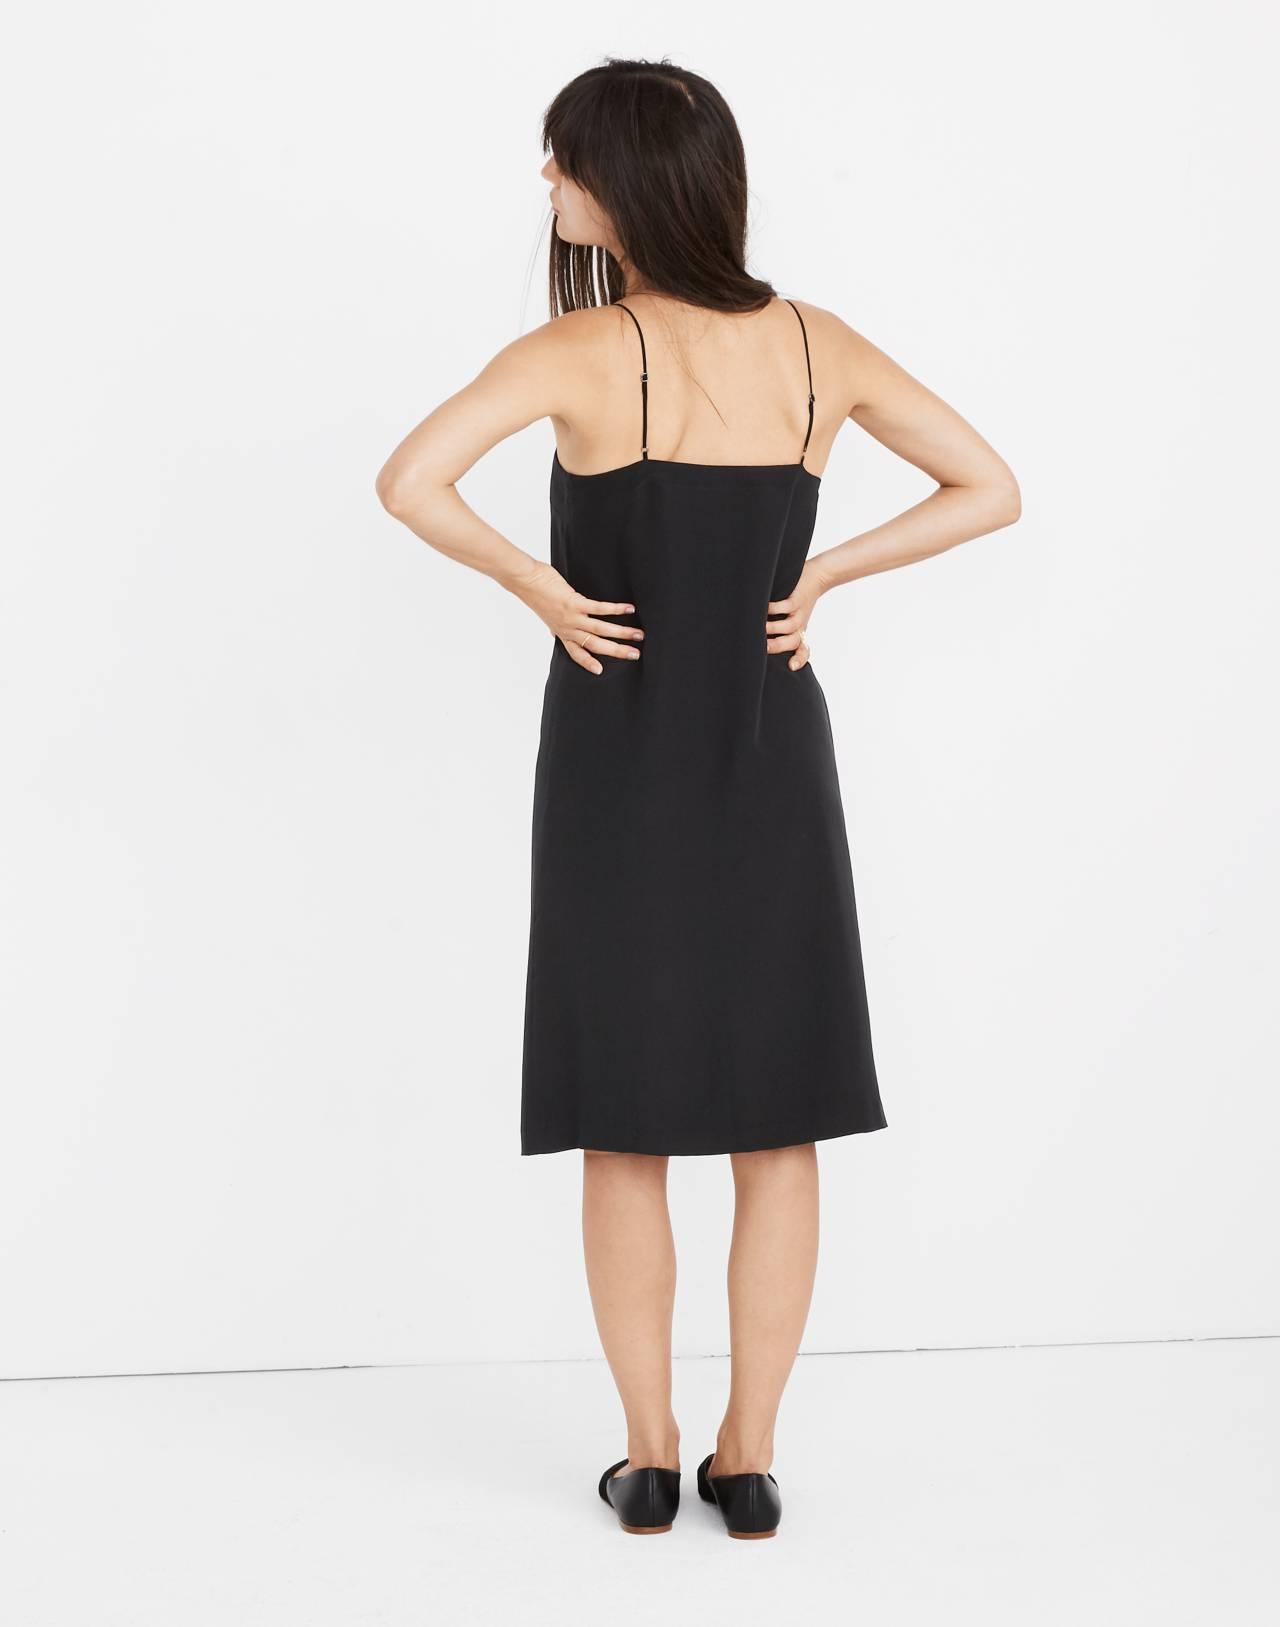 Silk Button-Front Slip Dress in true black image 3